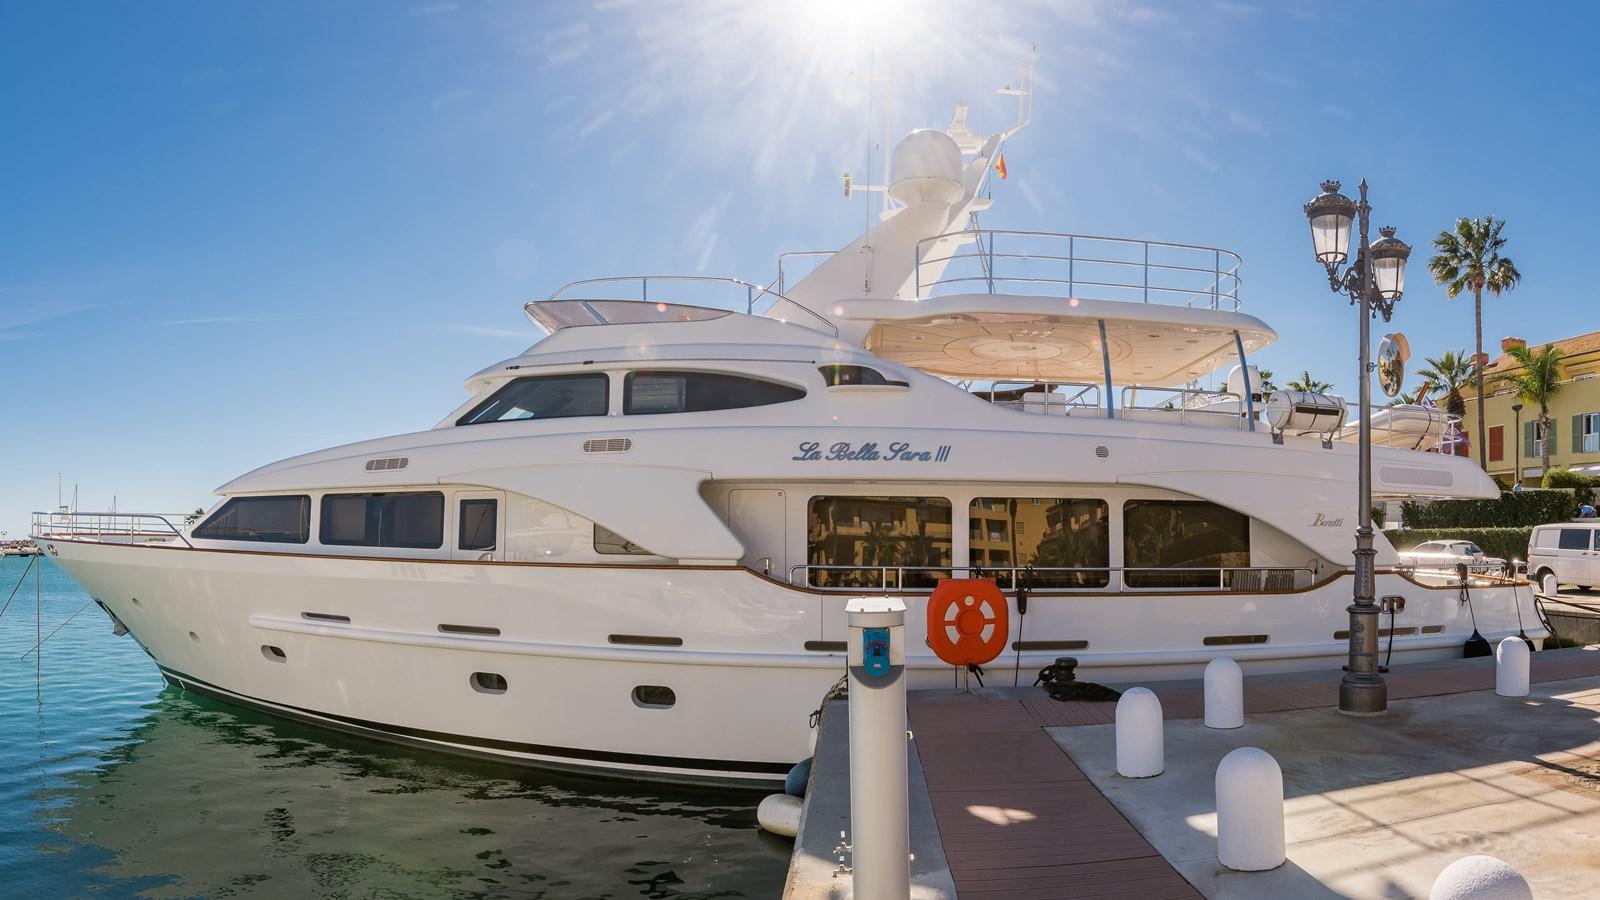 La Bella Sara III yacht for sale